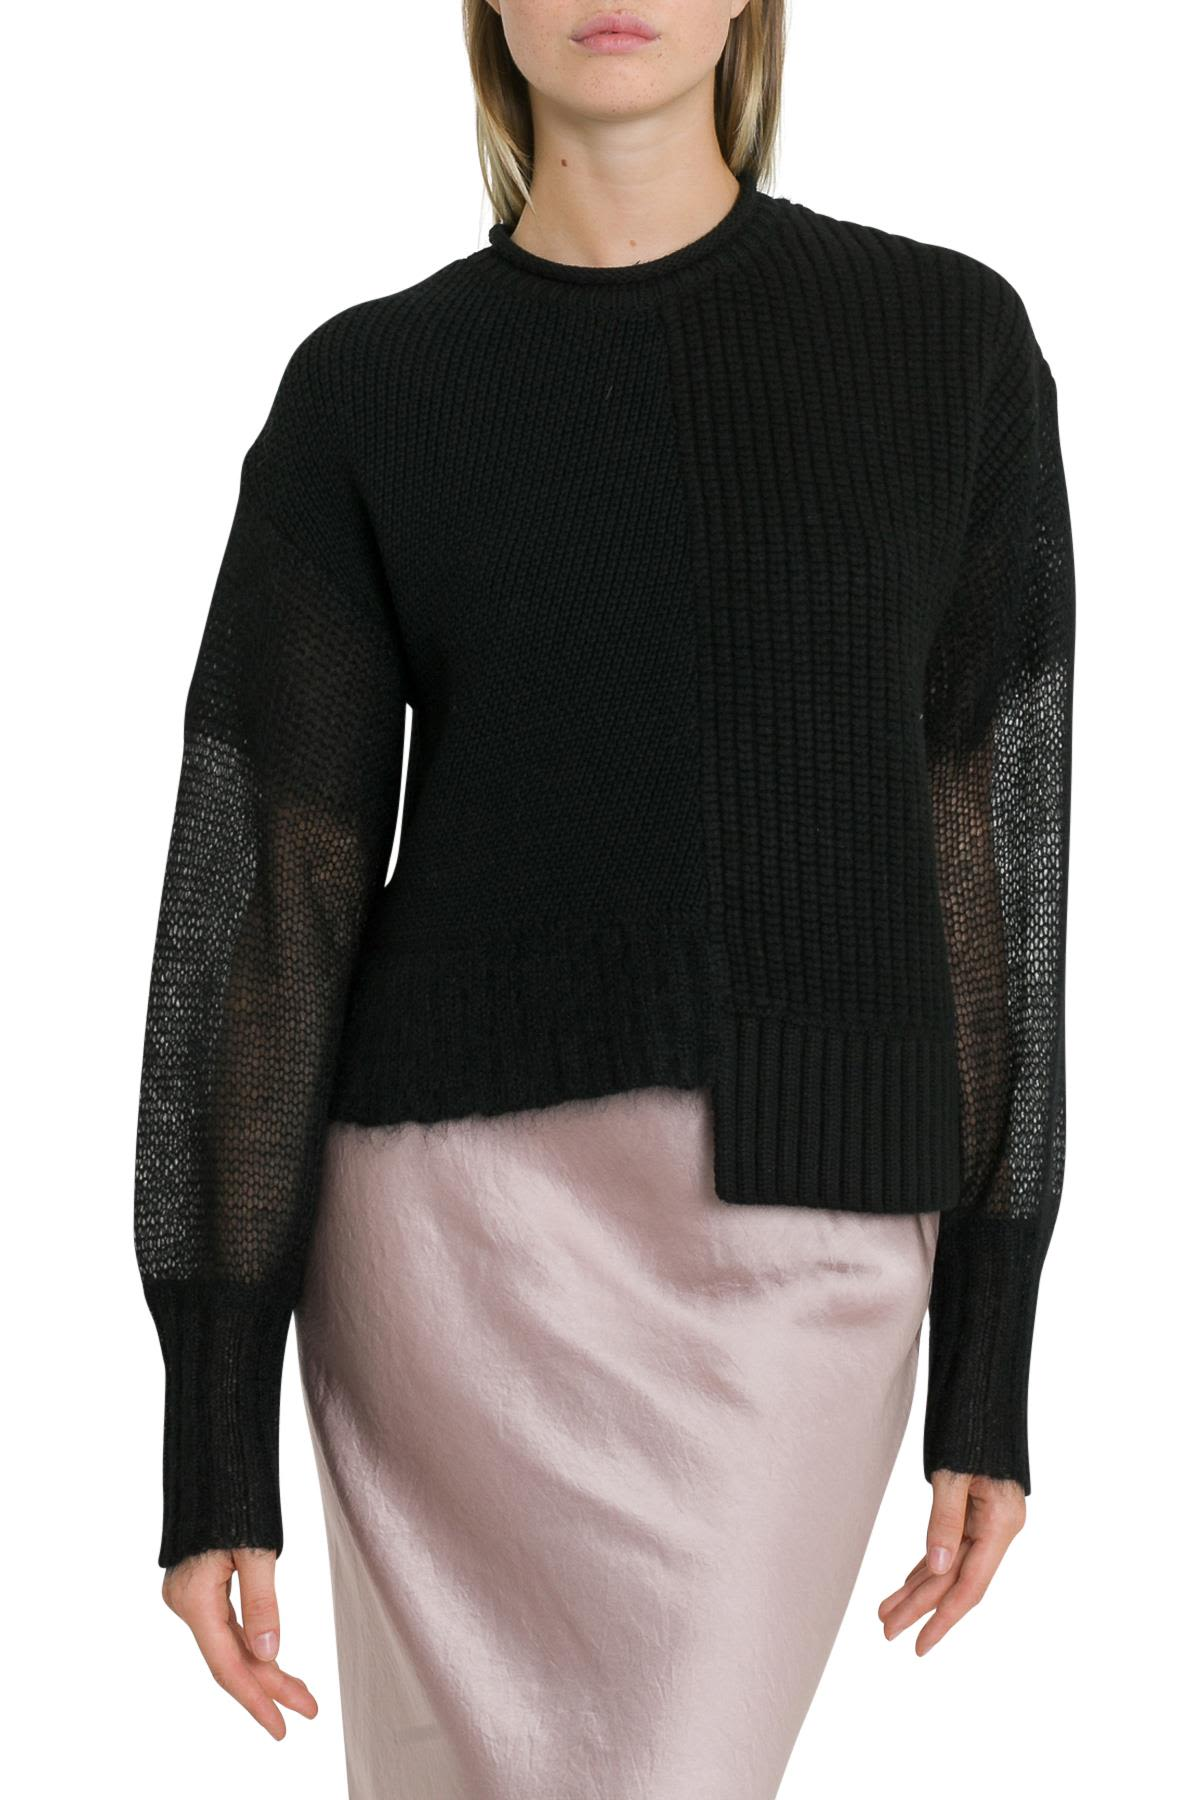 T by Alexander Wang Ribbed Asymmetrical Knitted Jjumper